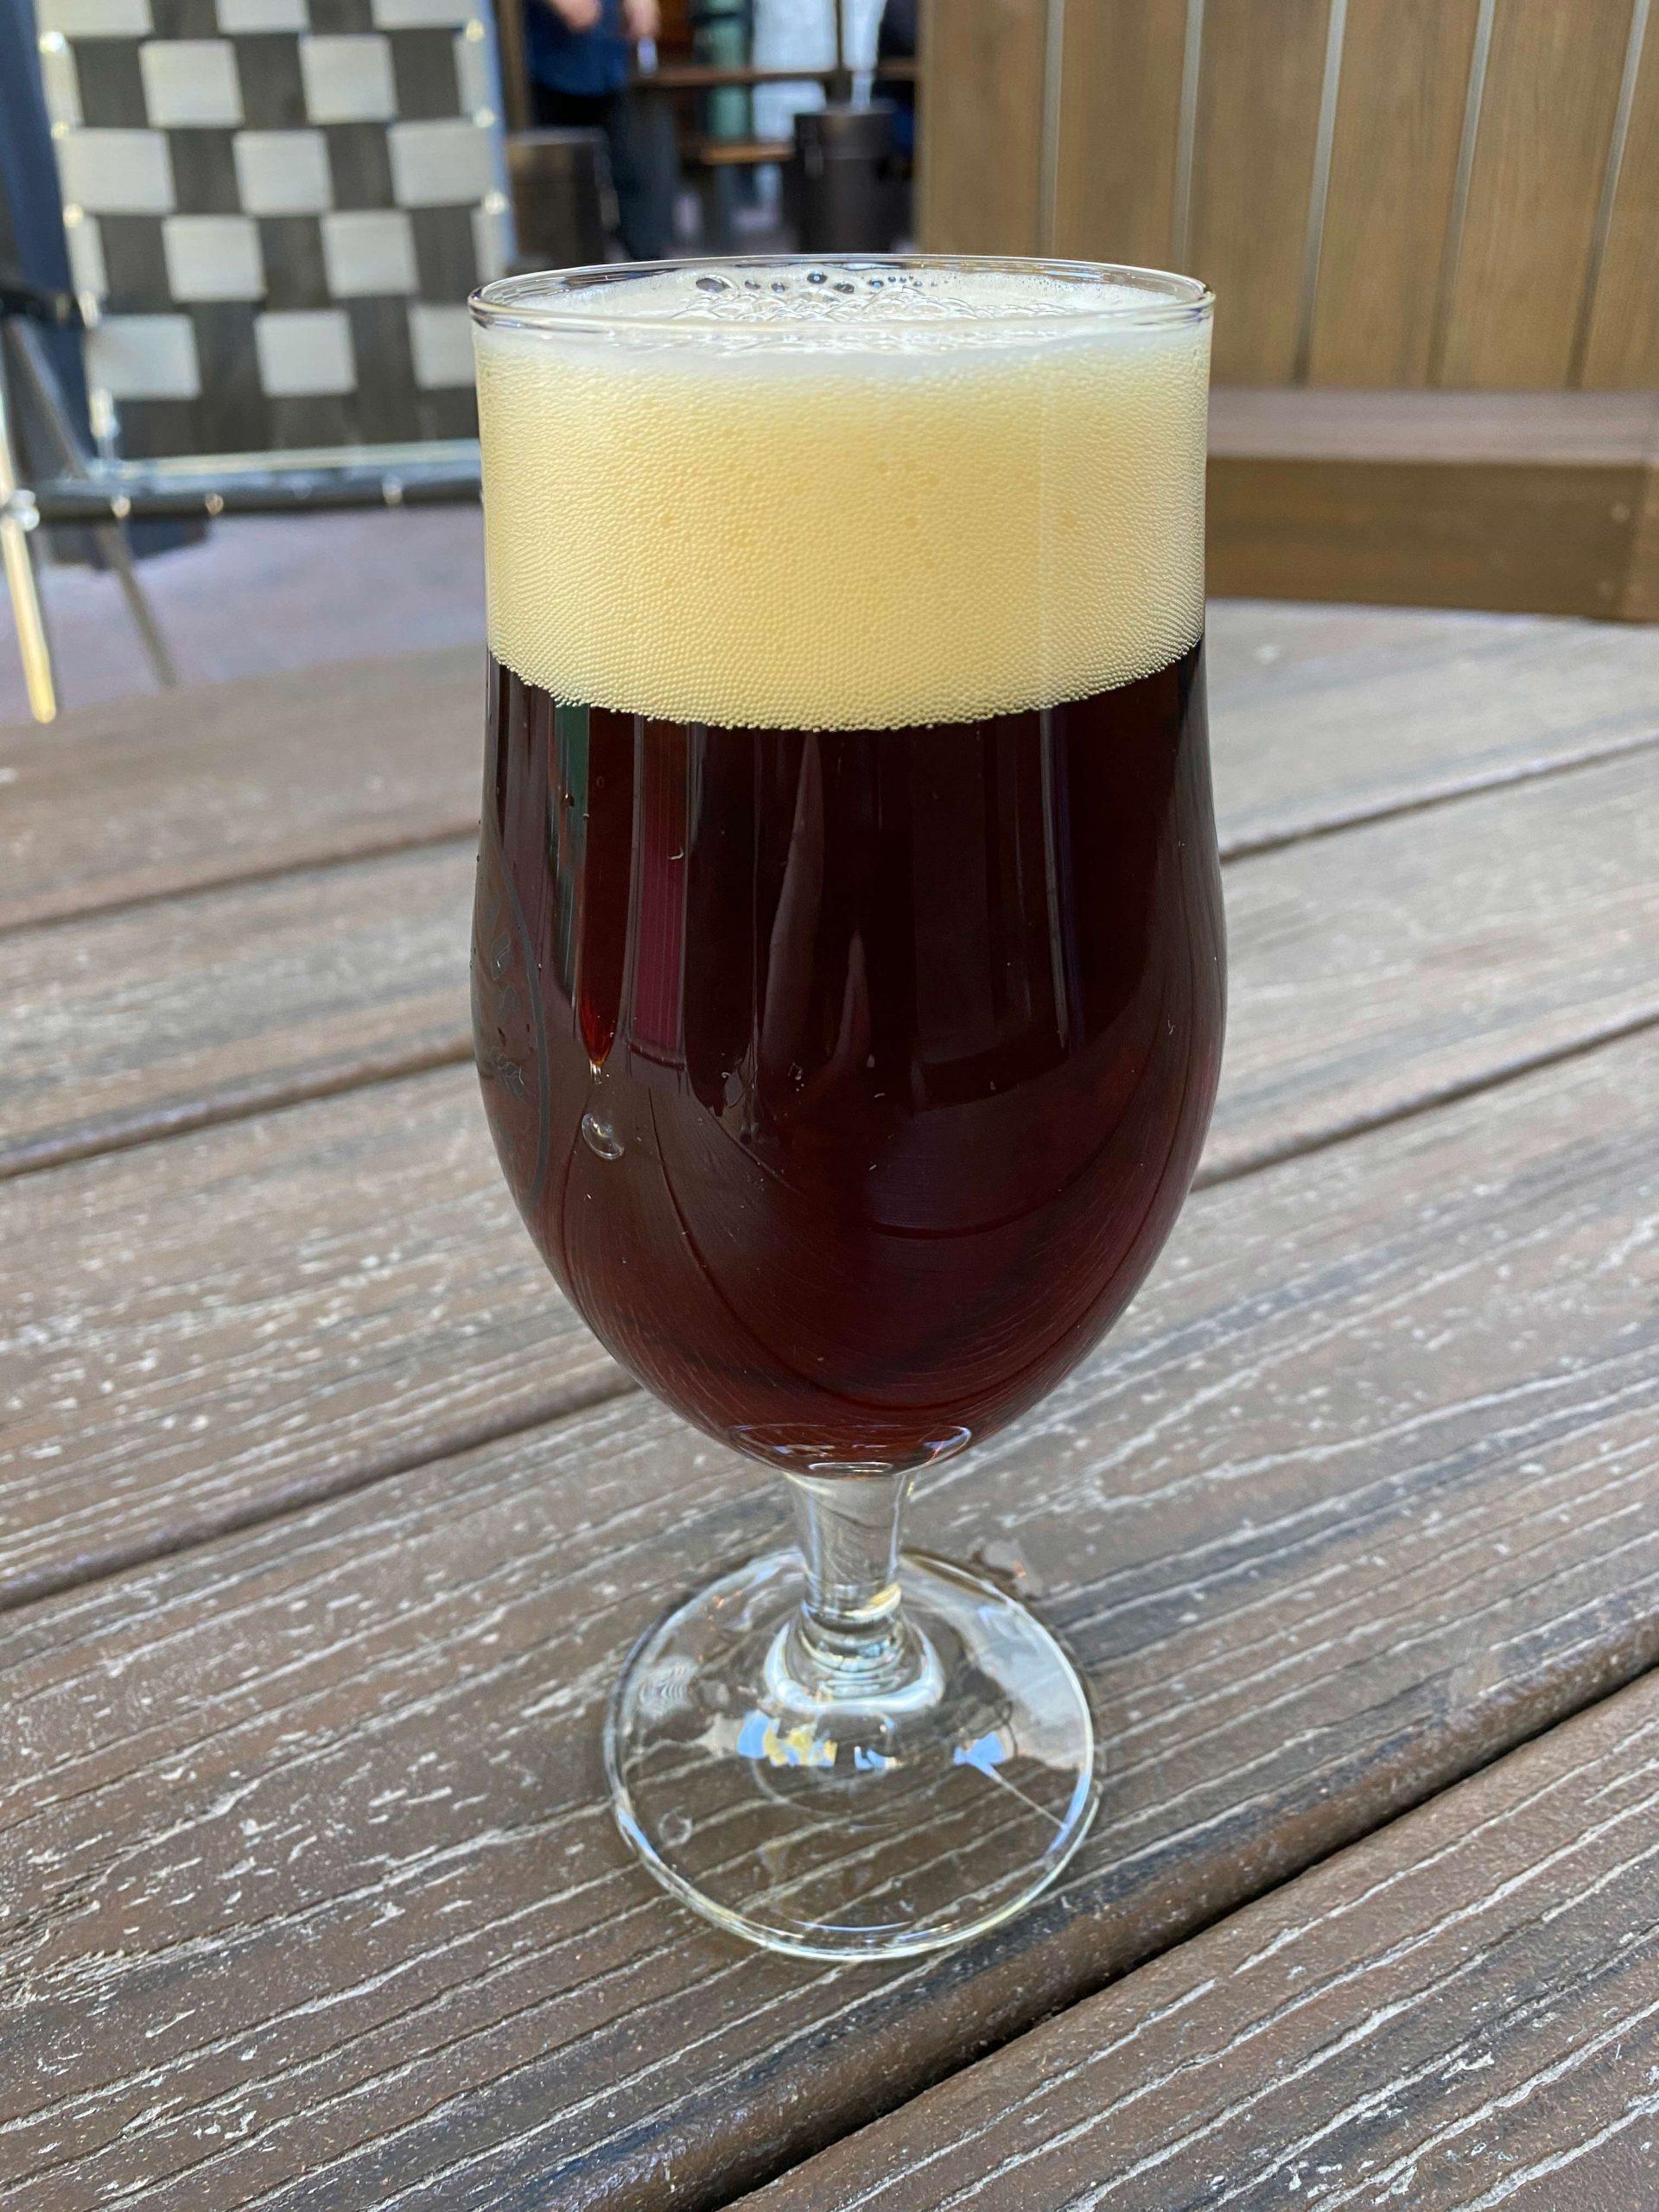 Dopplebock from Pedal Haus Brewery. Photo credit Matthew Johnson.